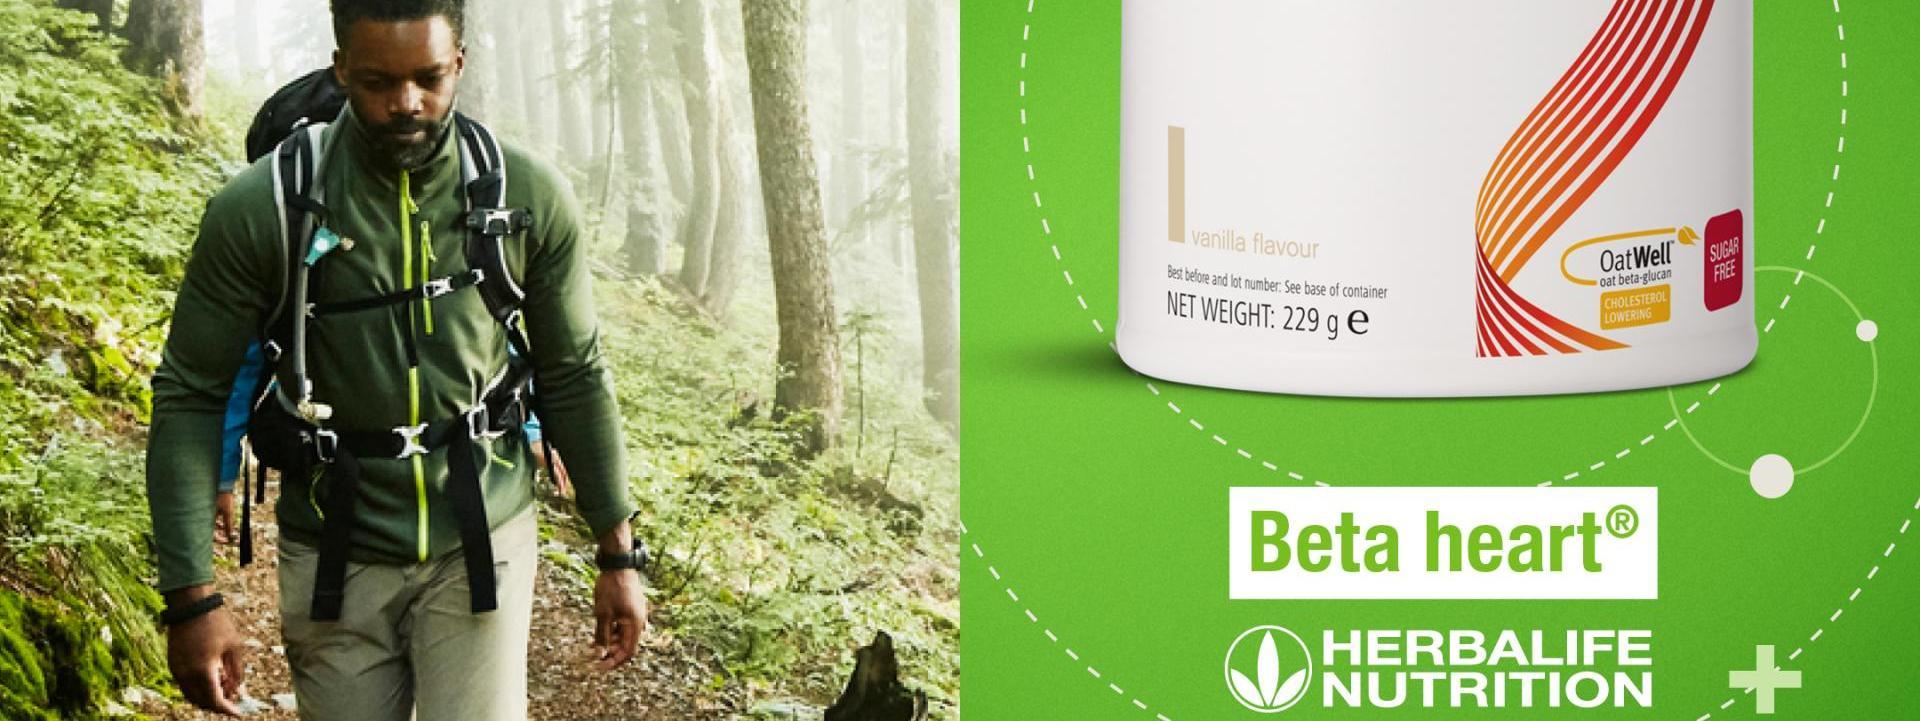 Beta heart® Herbalife Nutrition UK